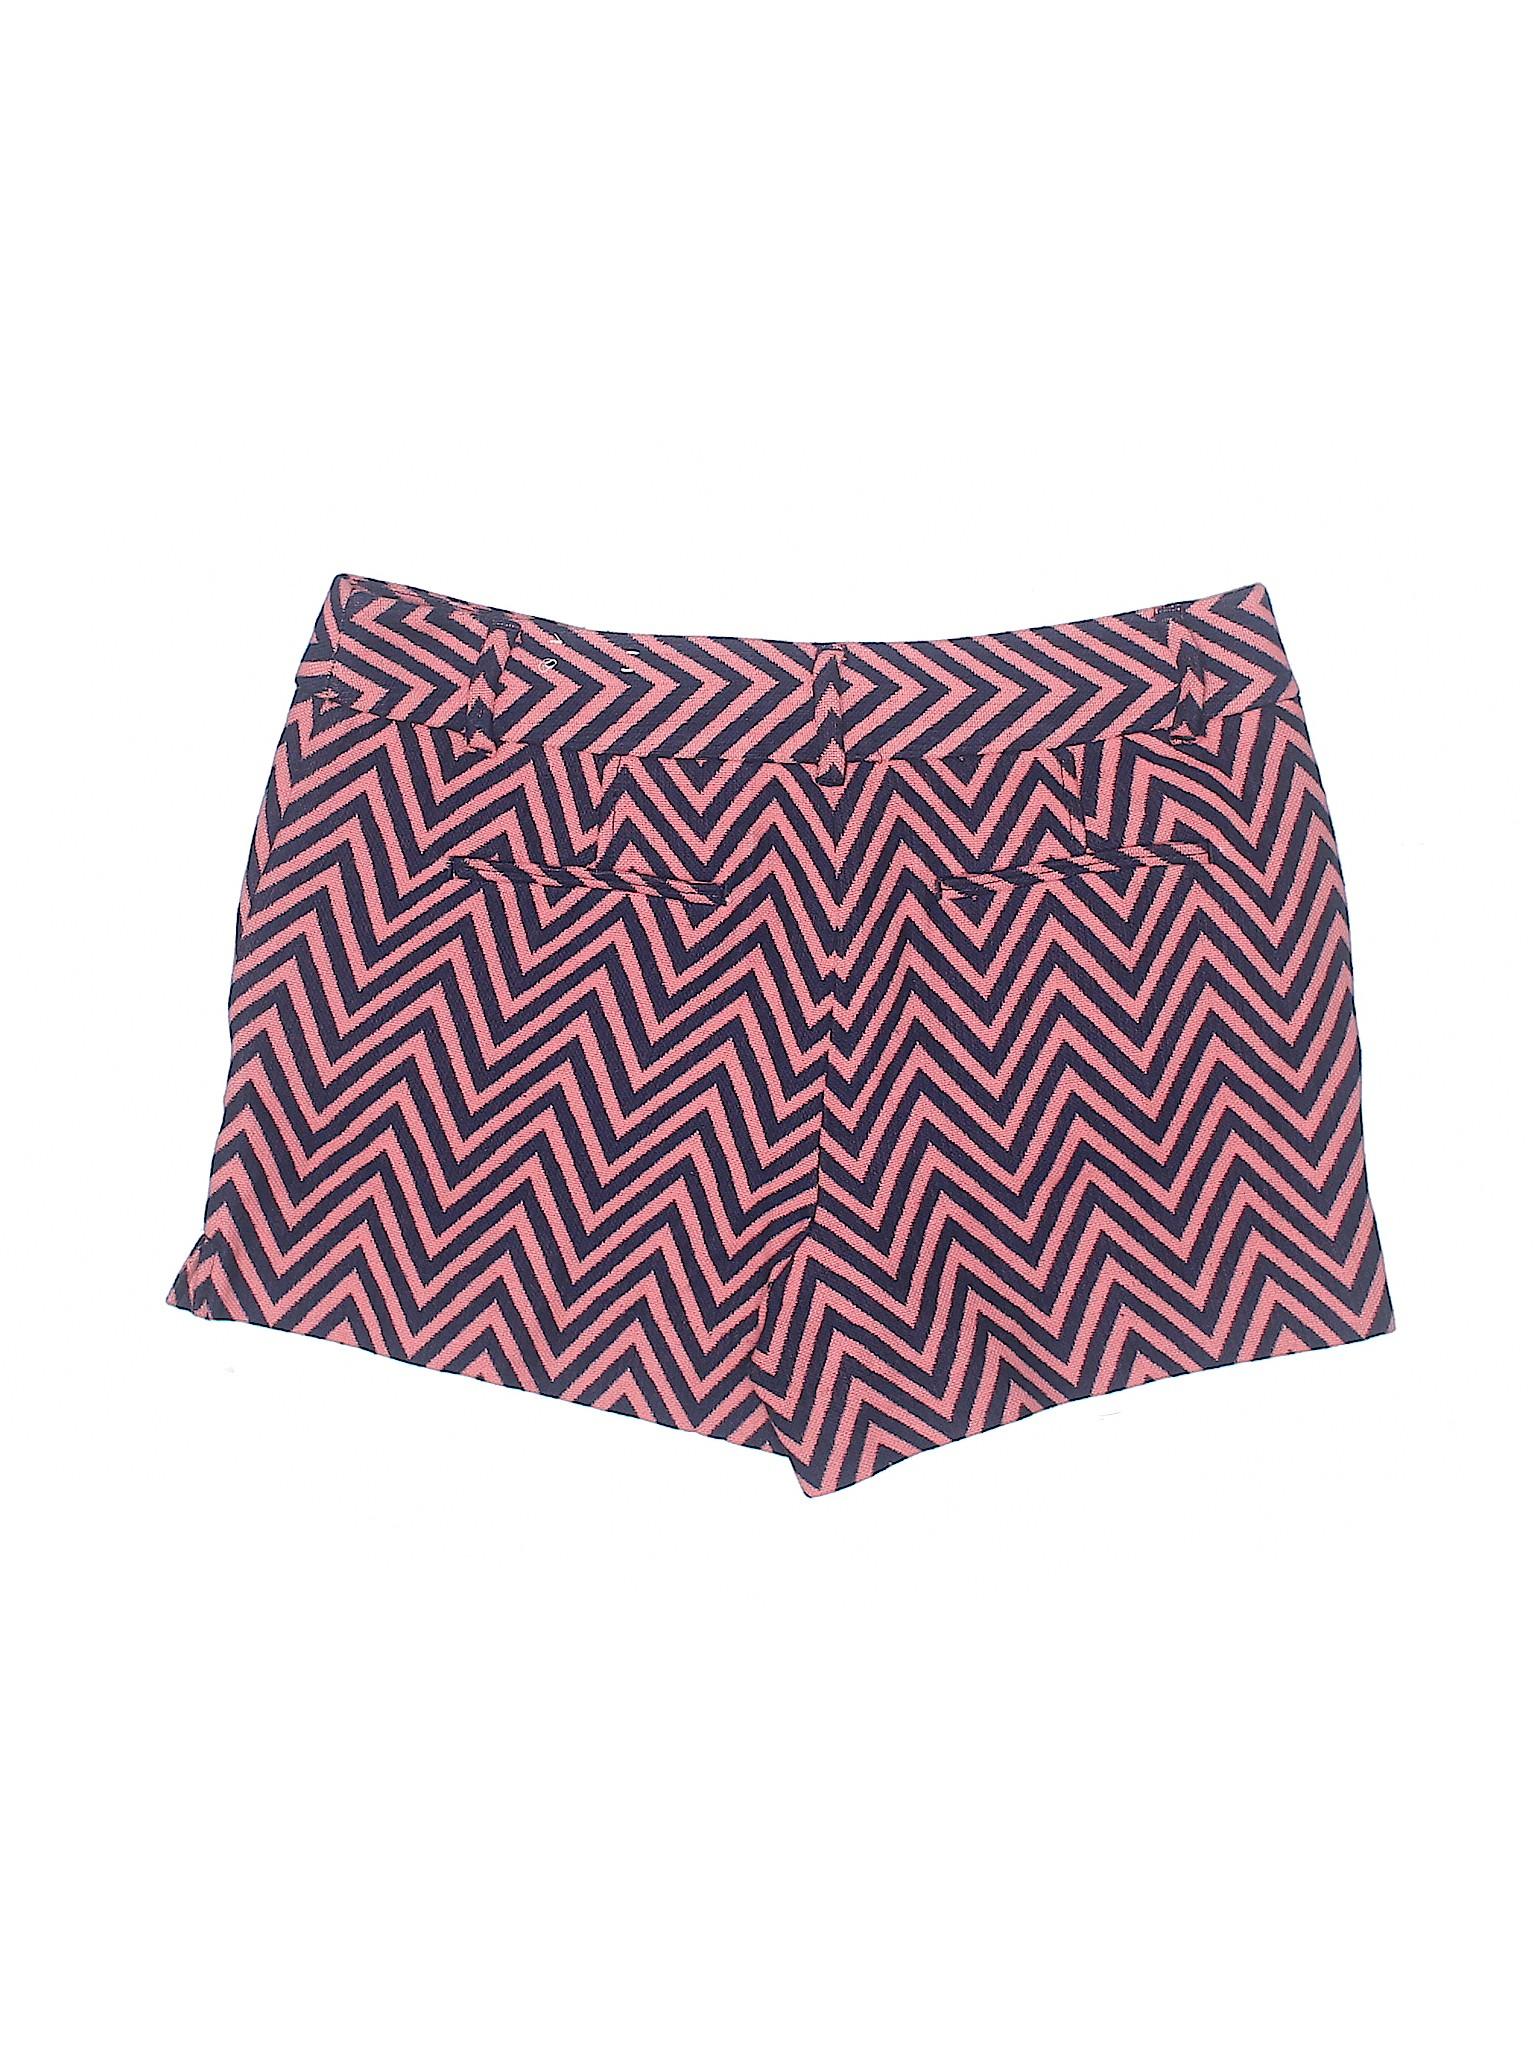 LOFT leisure Ann Taylor Boutique Shorts Dressy BUCw0